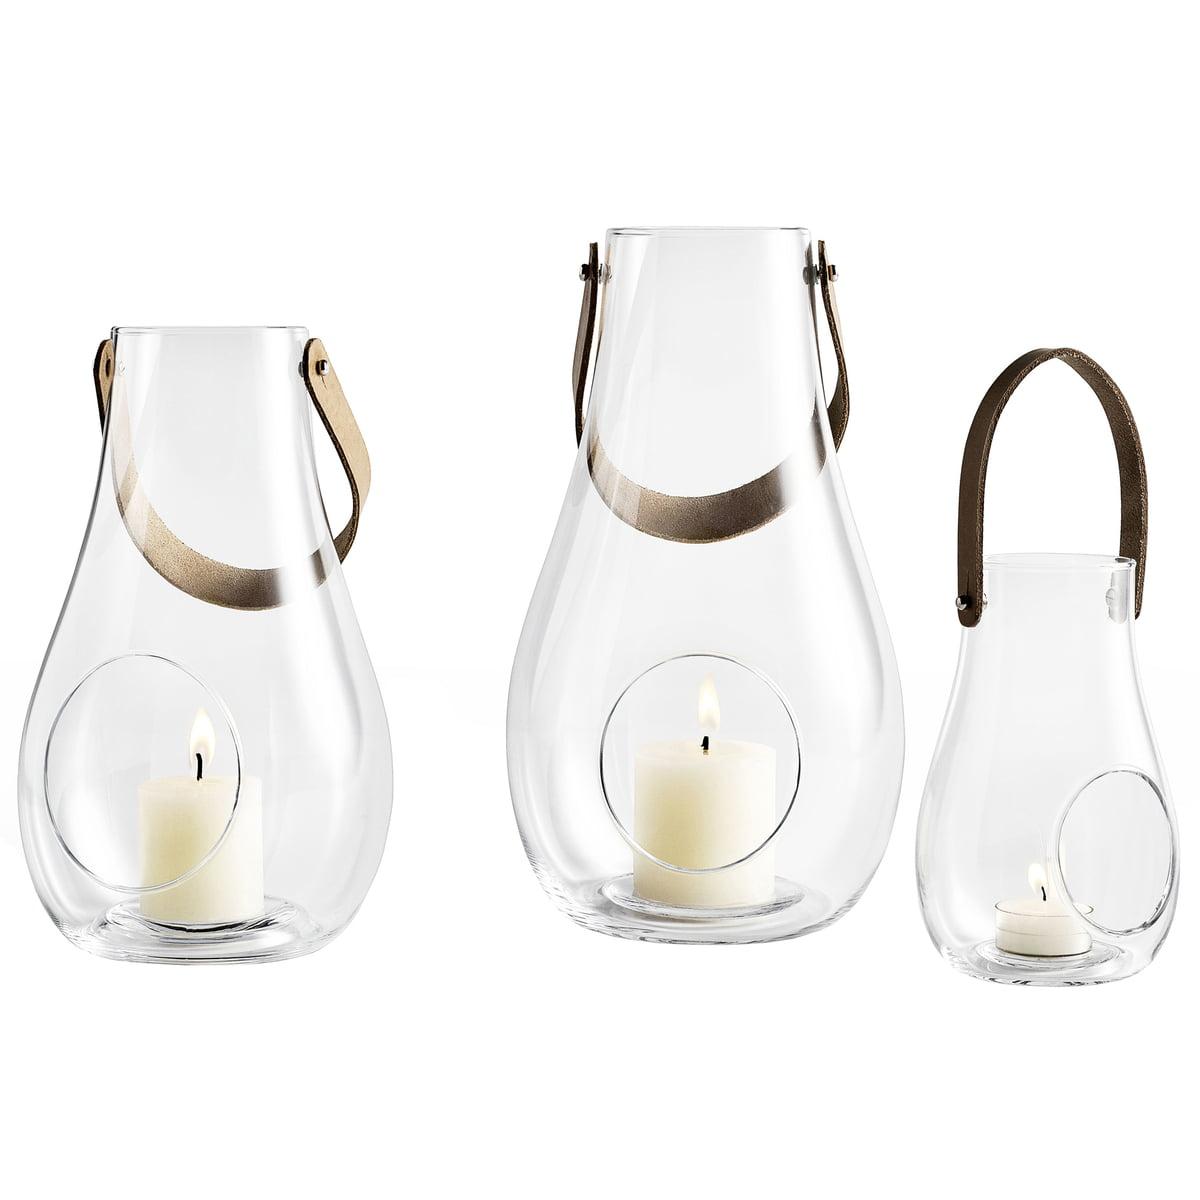 holmegaard design with light Design with light lantern | Holmegaard | Shop holmegaard design with light